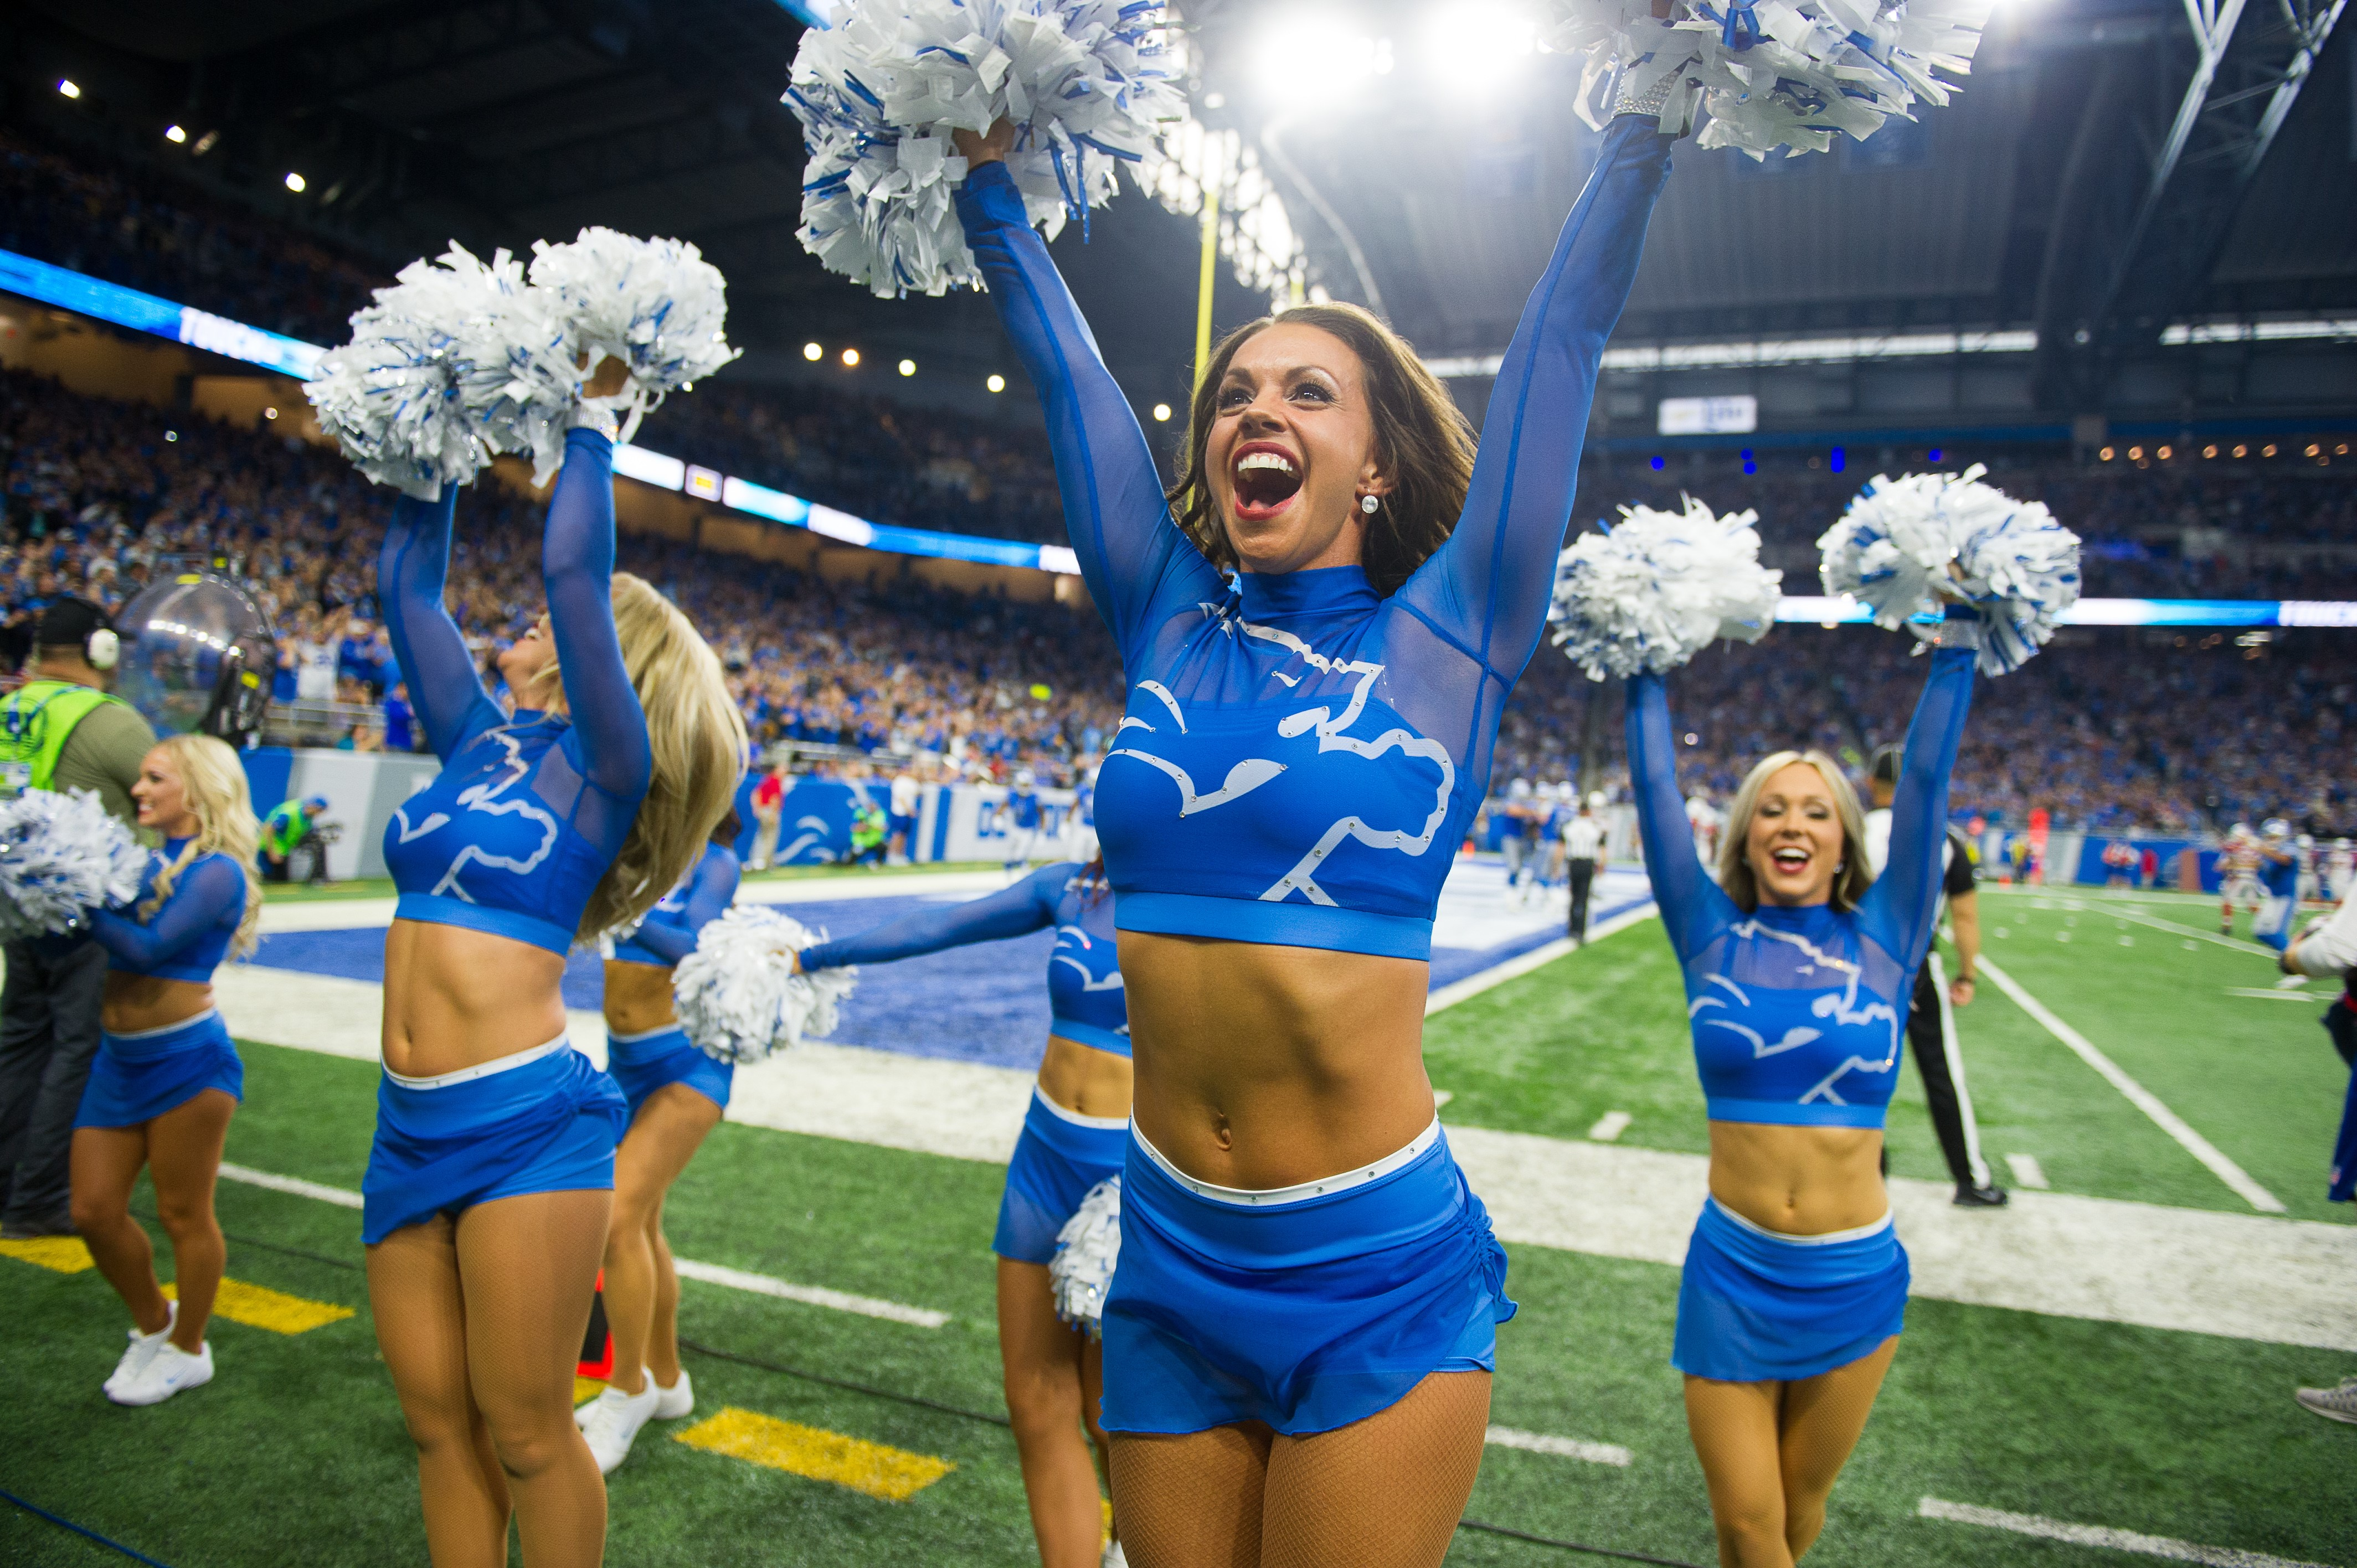 Detroit Lions Cheerleaders Blue Uniforms